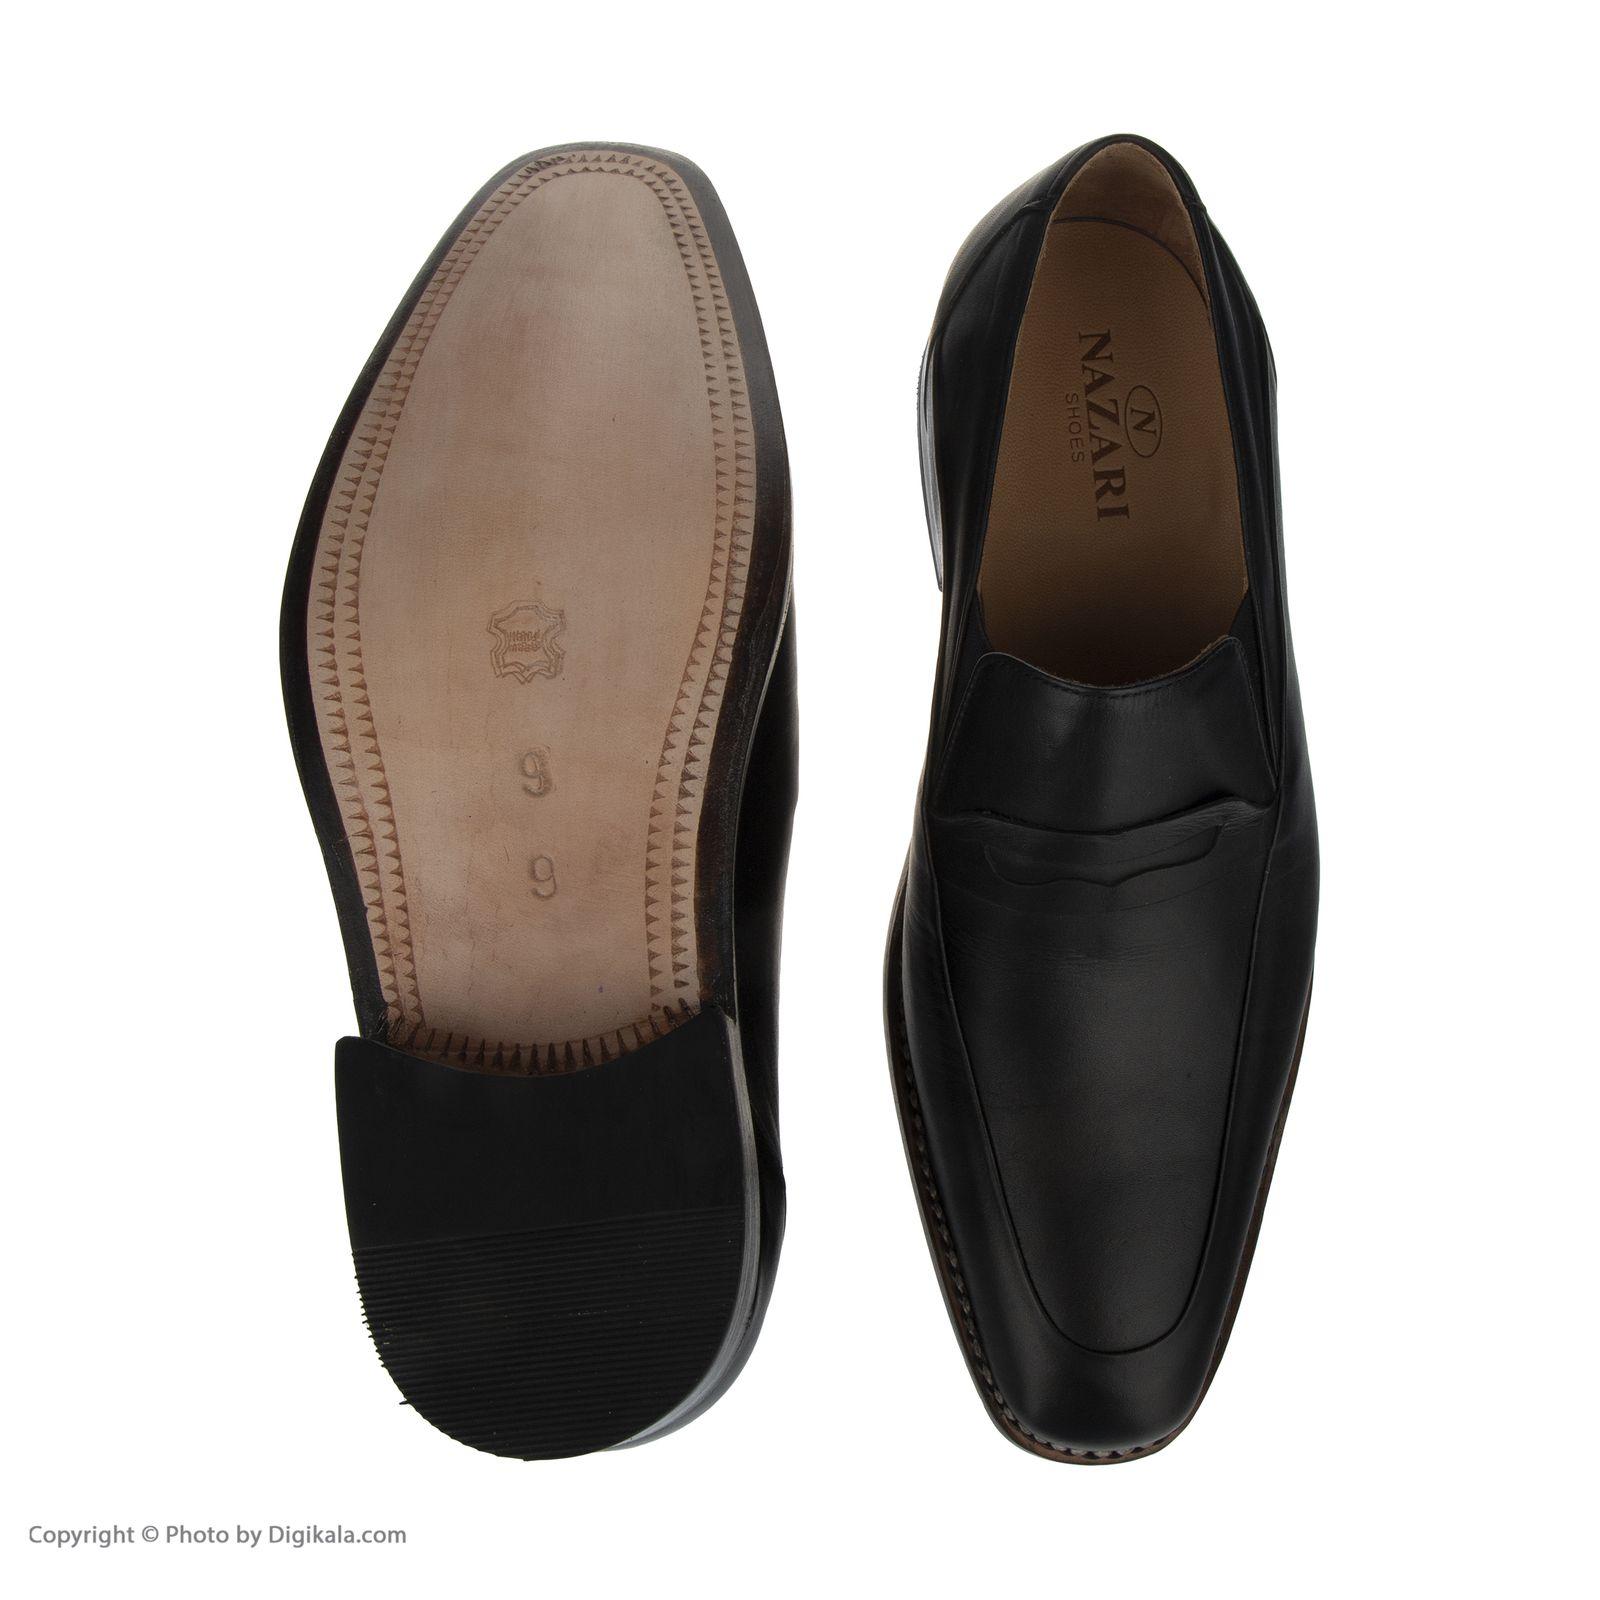 کفش مردانه نظری کد 404 -  - 3